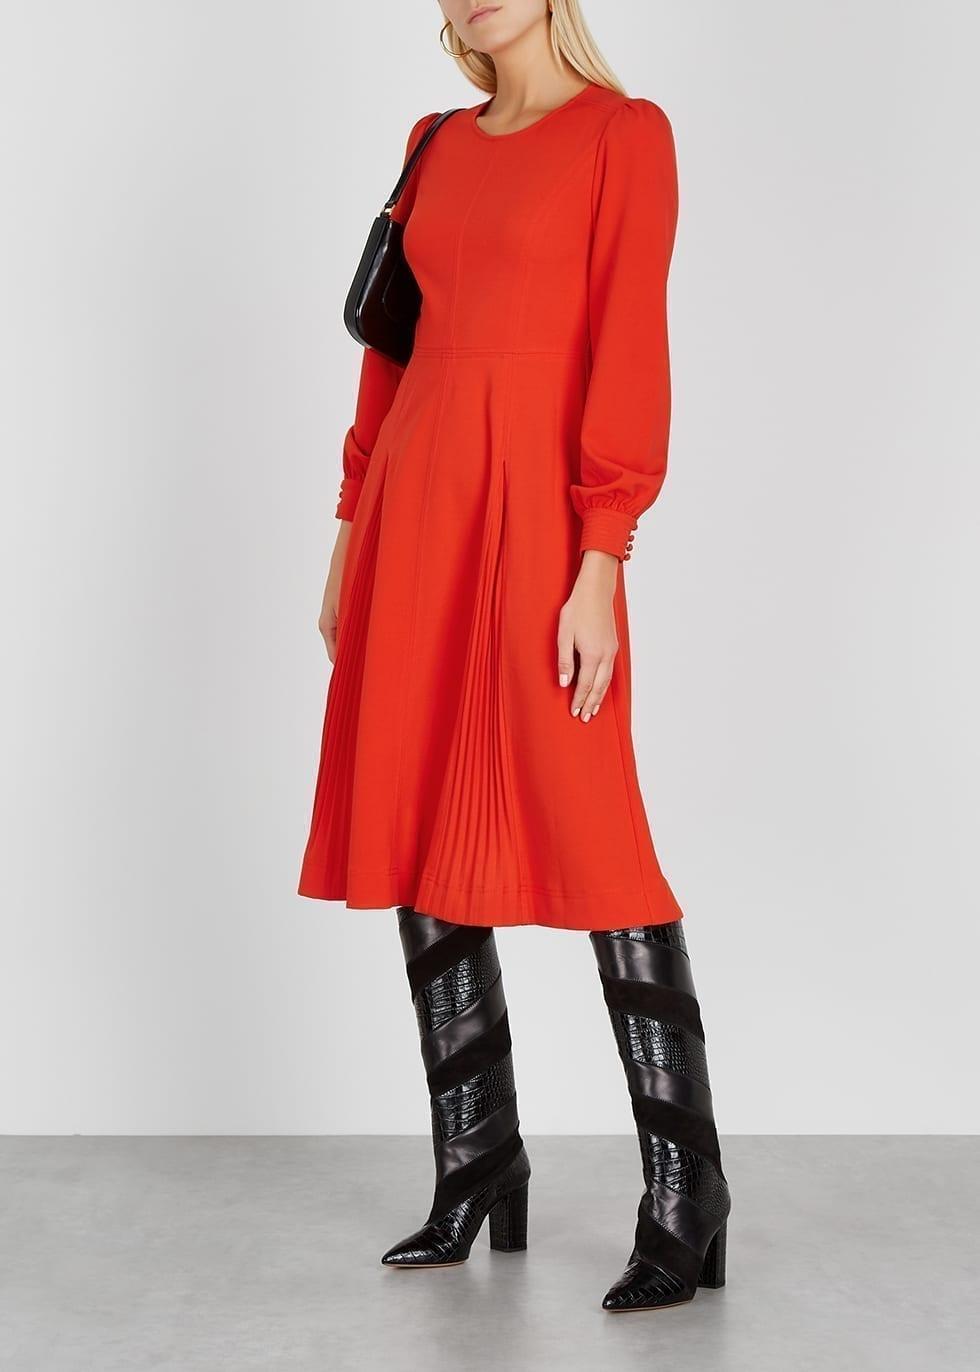 TORY BURCH Red Stretch-cady Midi Dress